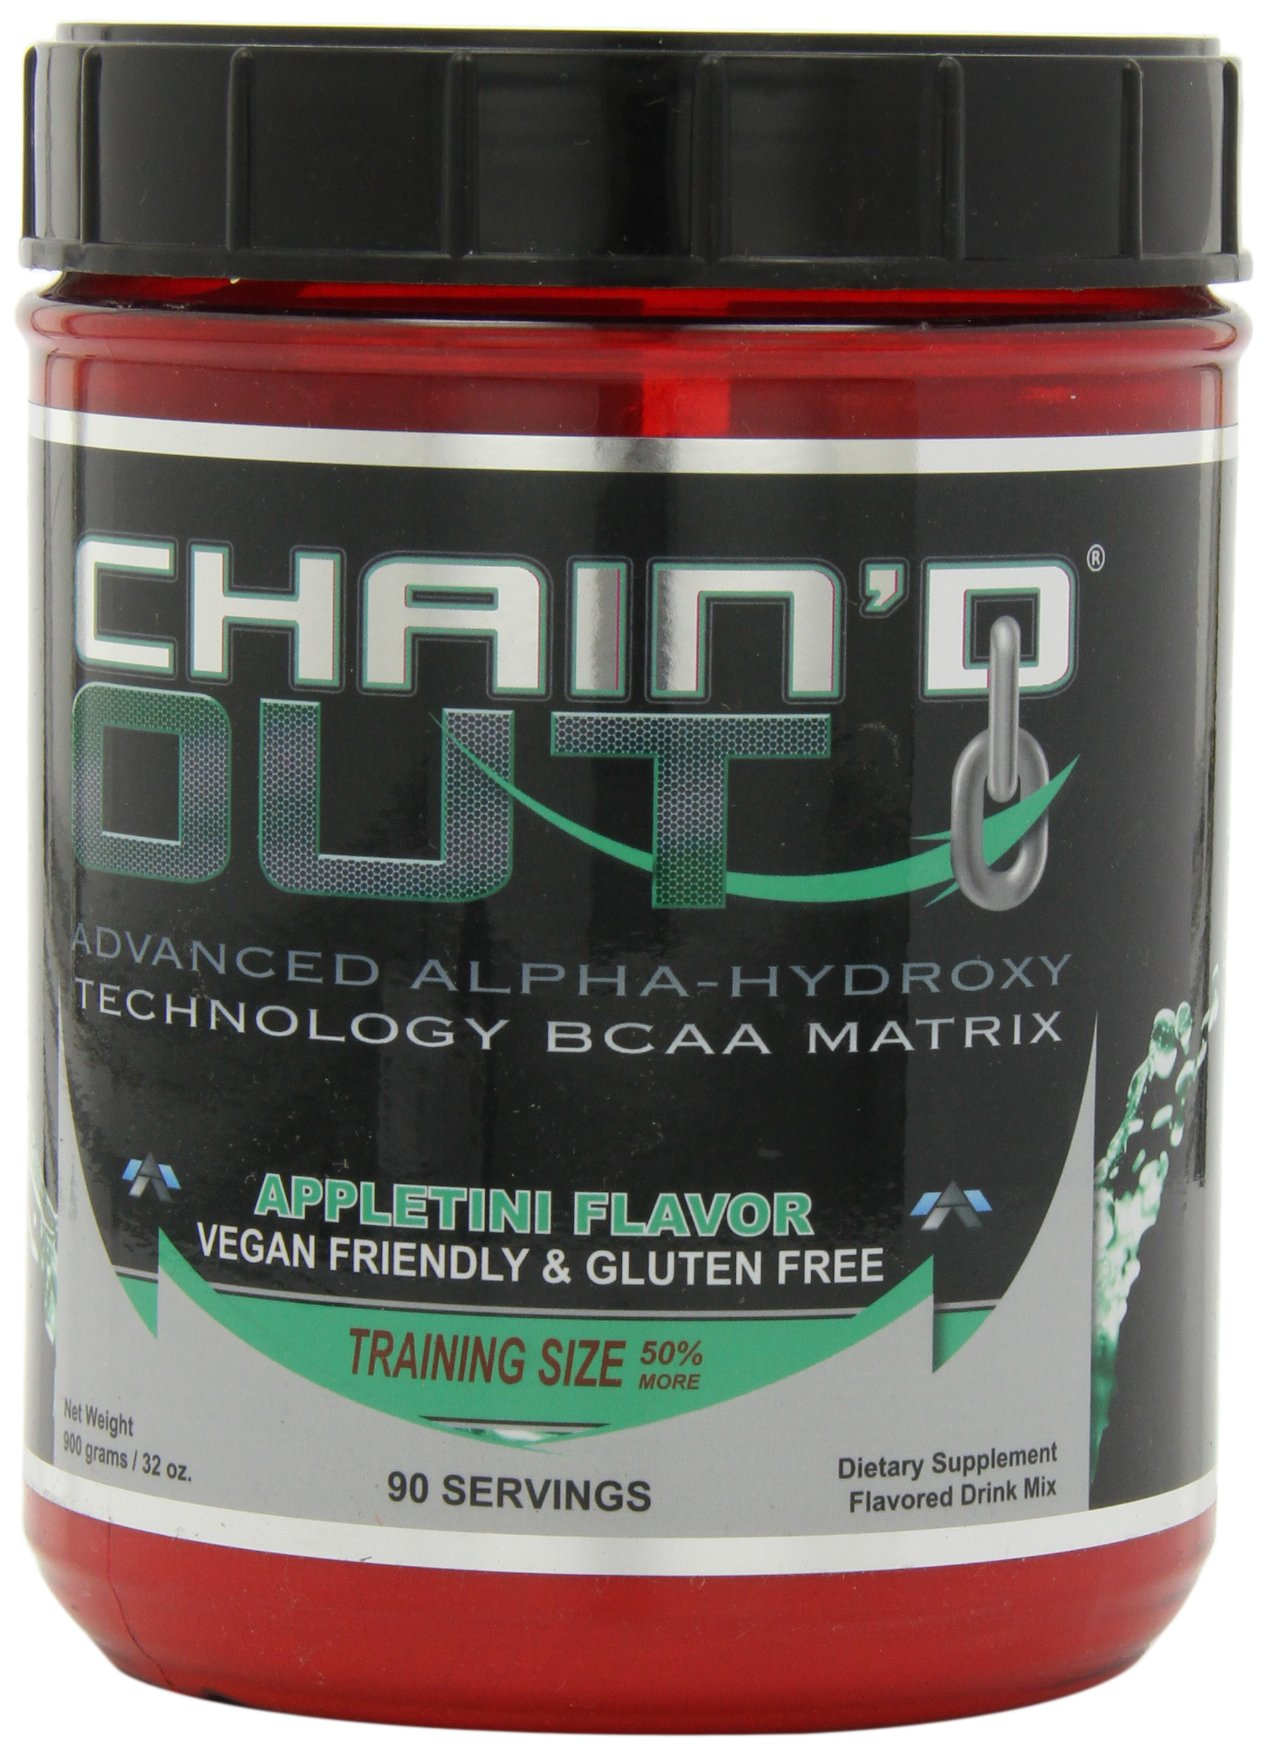 ALR Industries Chain'd Out, Vegan Friendly & Gluten Free Advanced Technology BCAA Matrix, Appletini, 900 Gram/ 90 serving